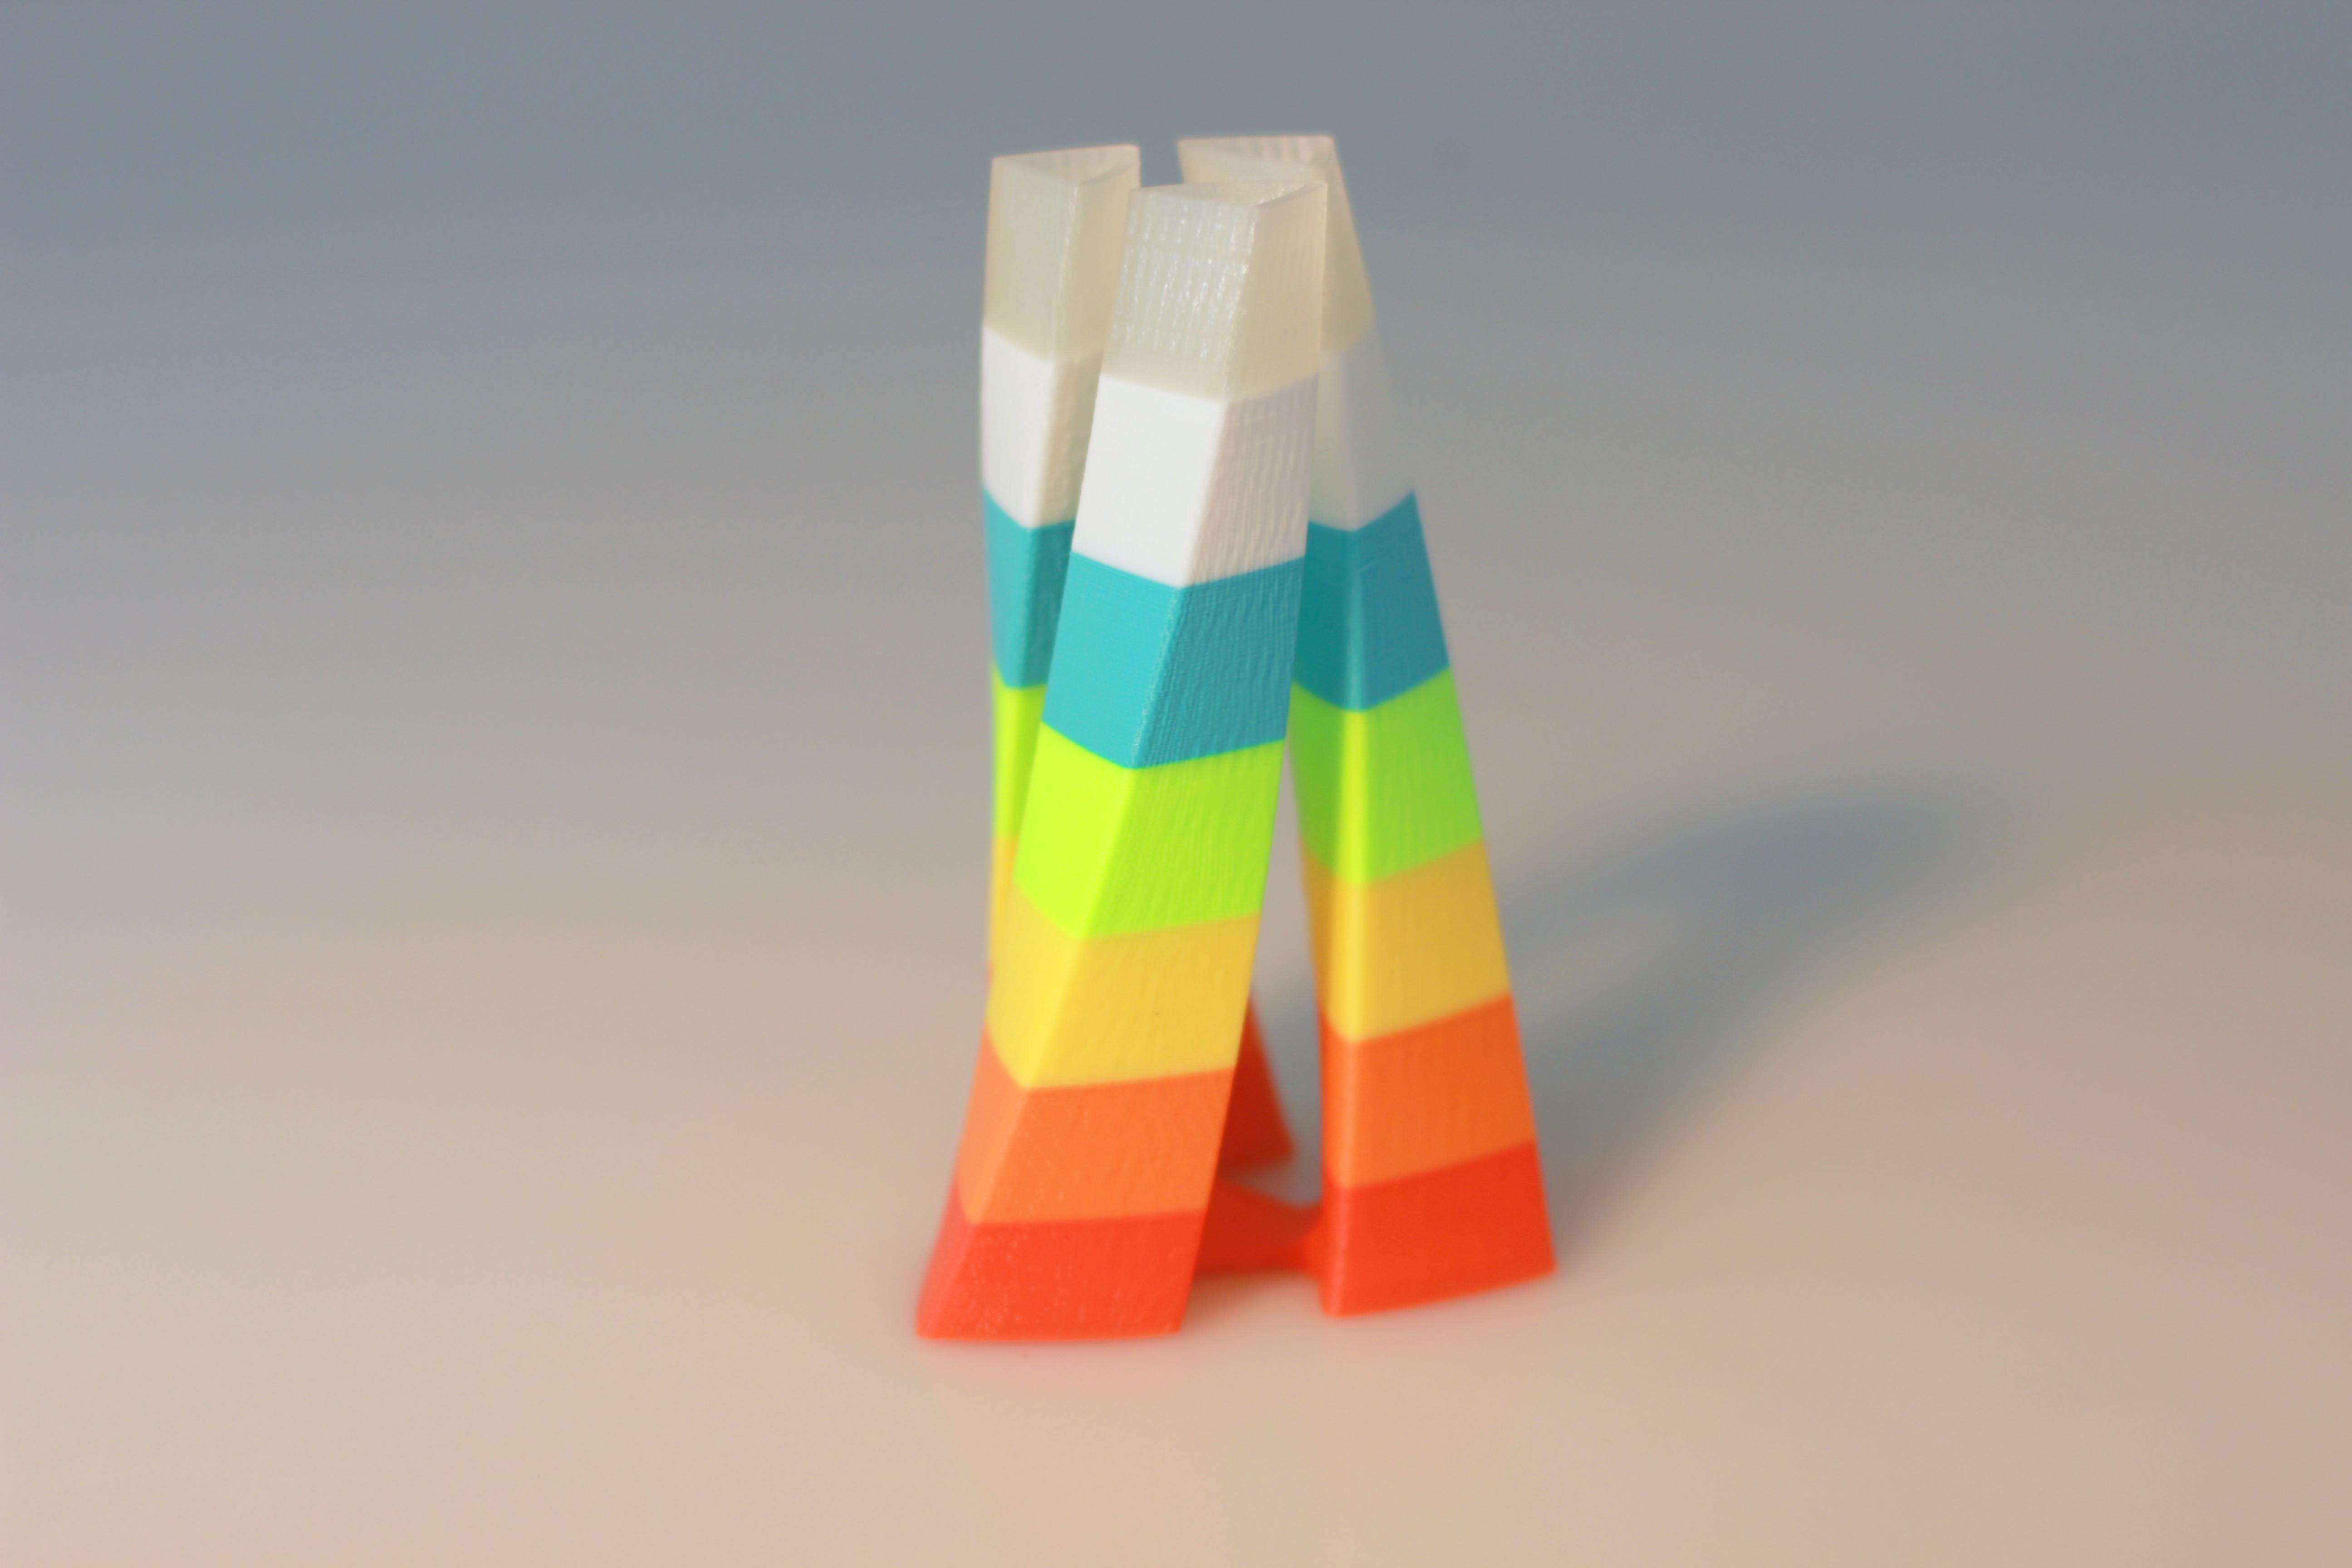 IMG_6600.JPG Download free STL file Tri-oval vase • 3D print design, BEEVERYCREATIVE